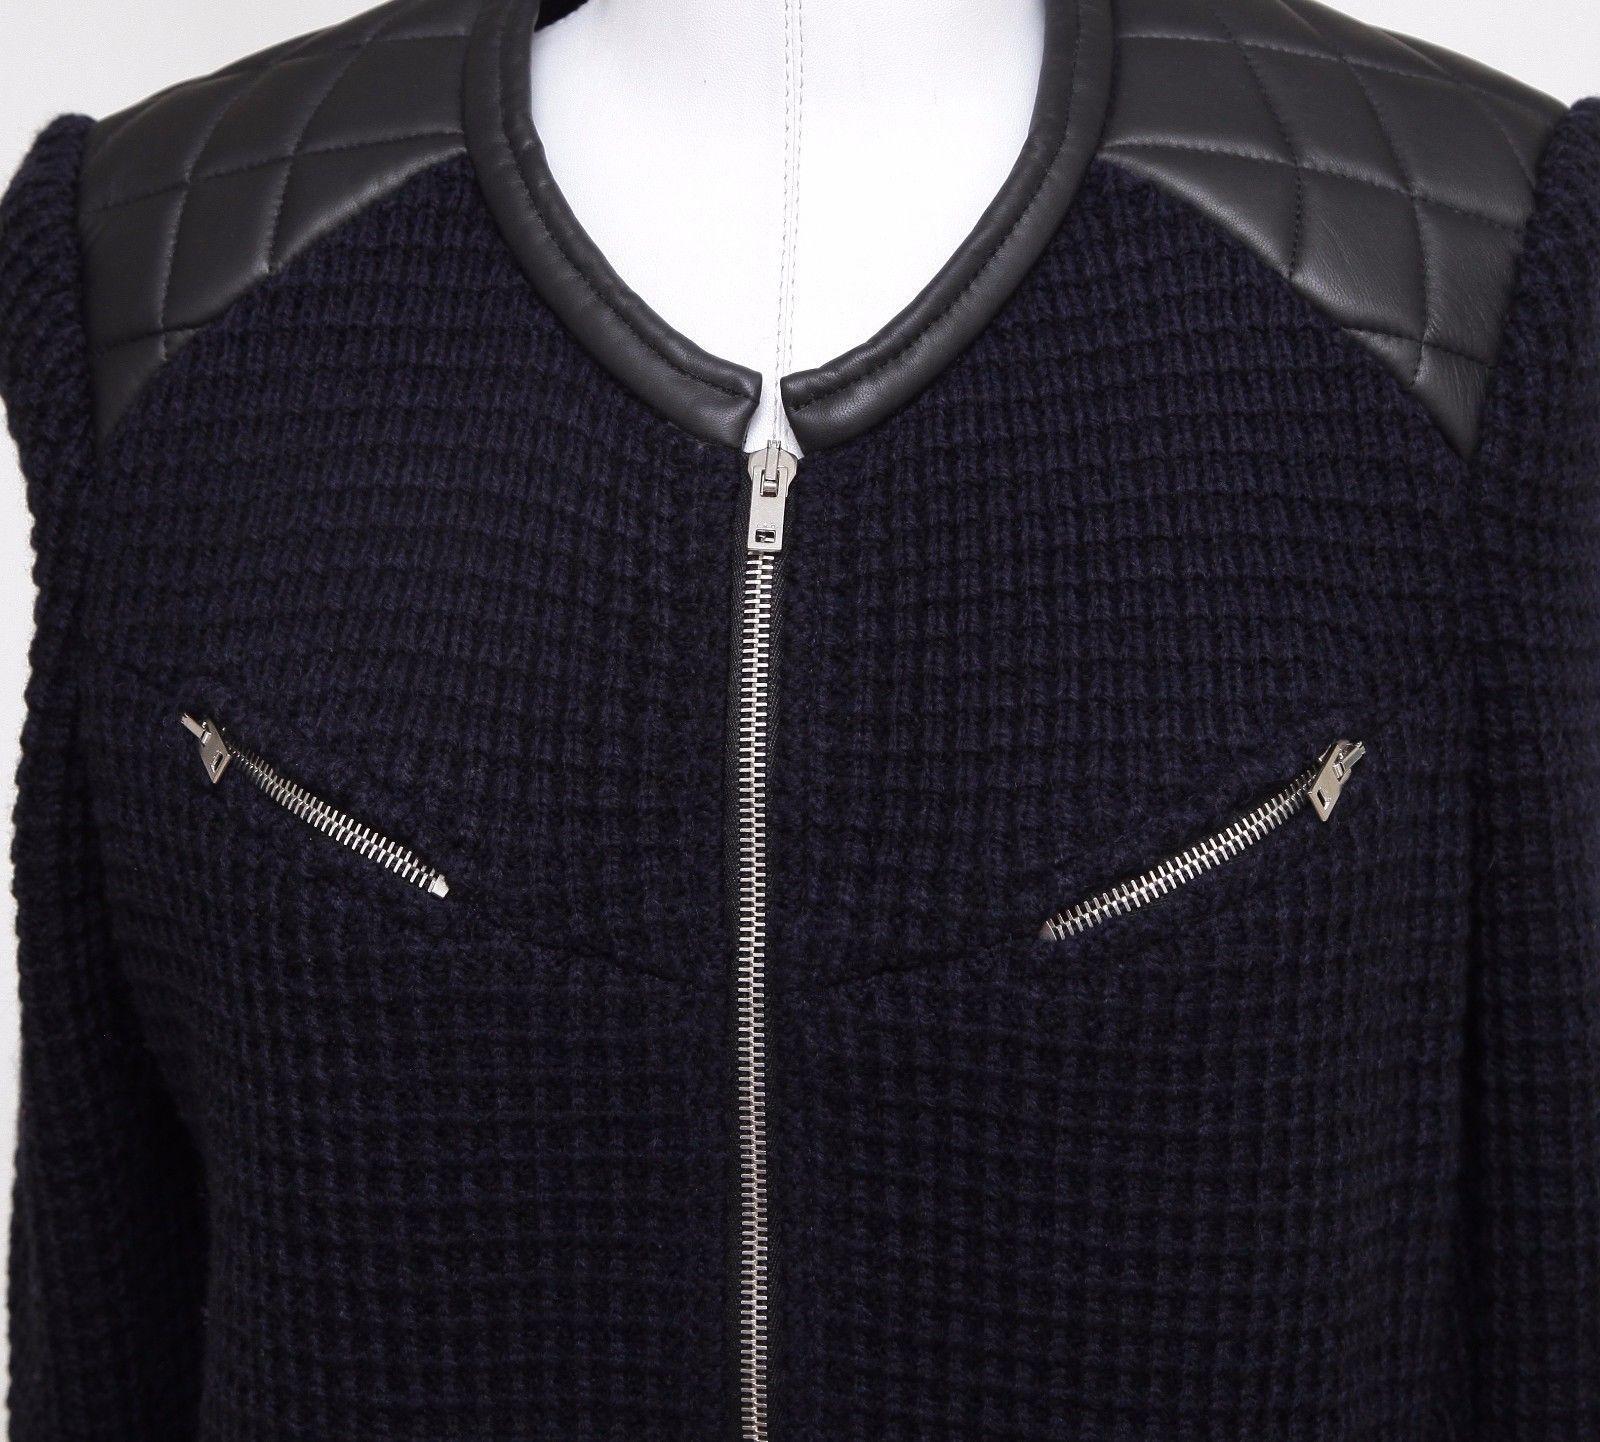 IRO CEYLONA Jacket Coat Leather Knit Black Midnight Blue Long Sleeve Zipper 42